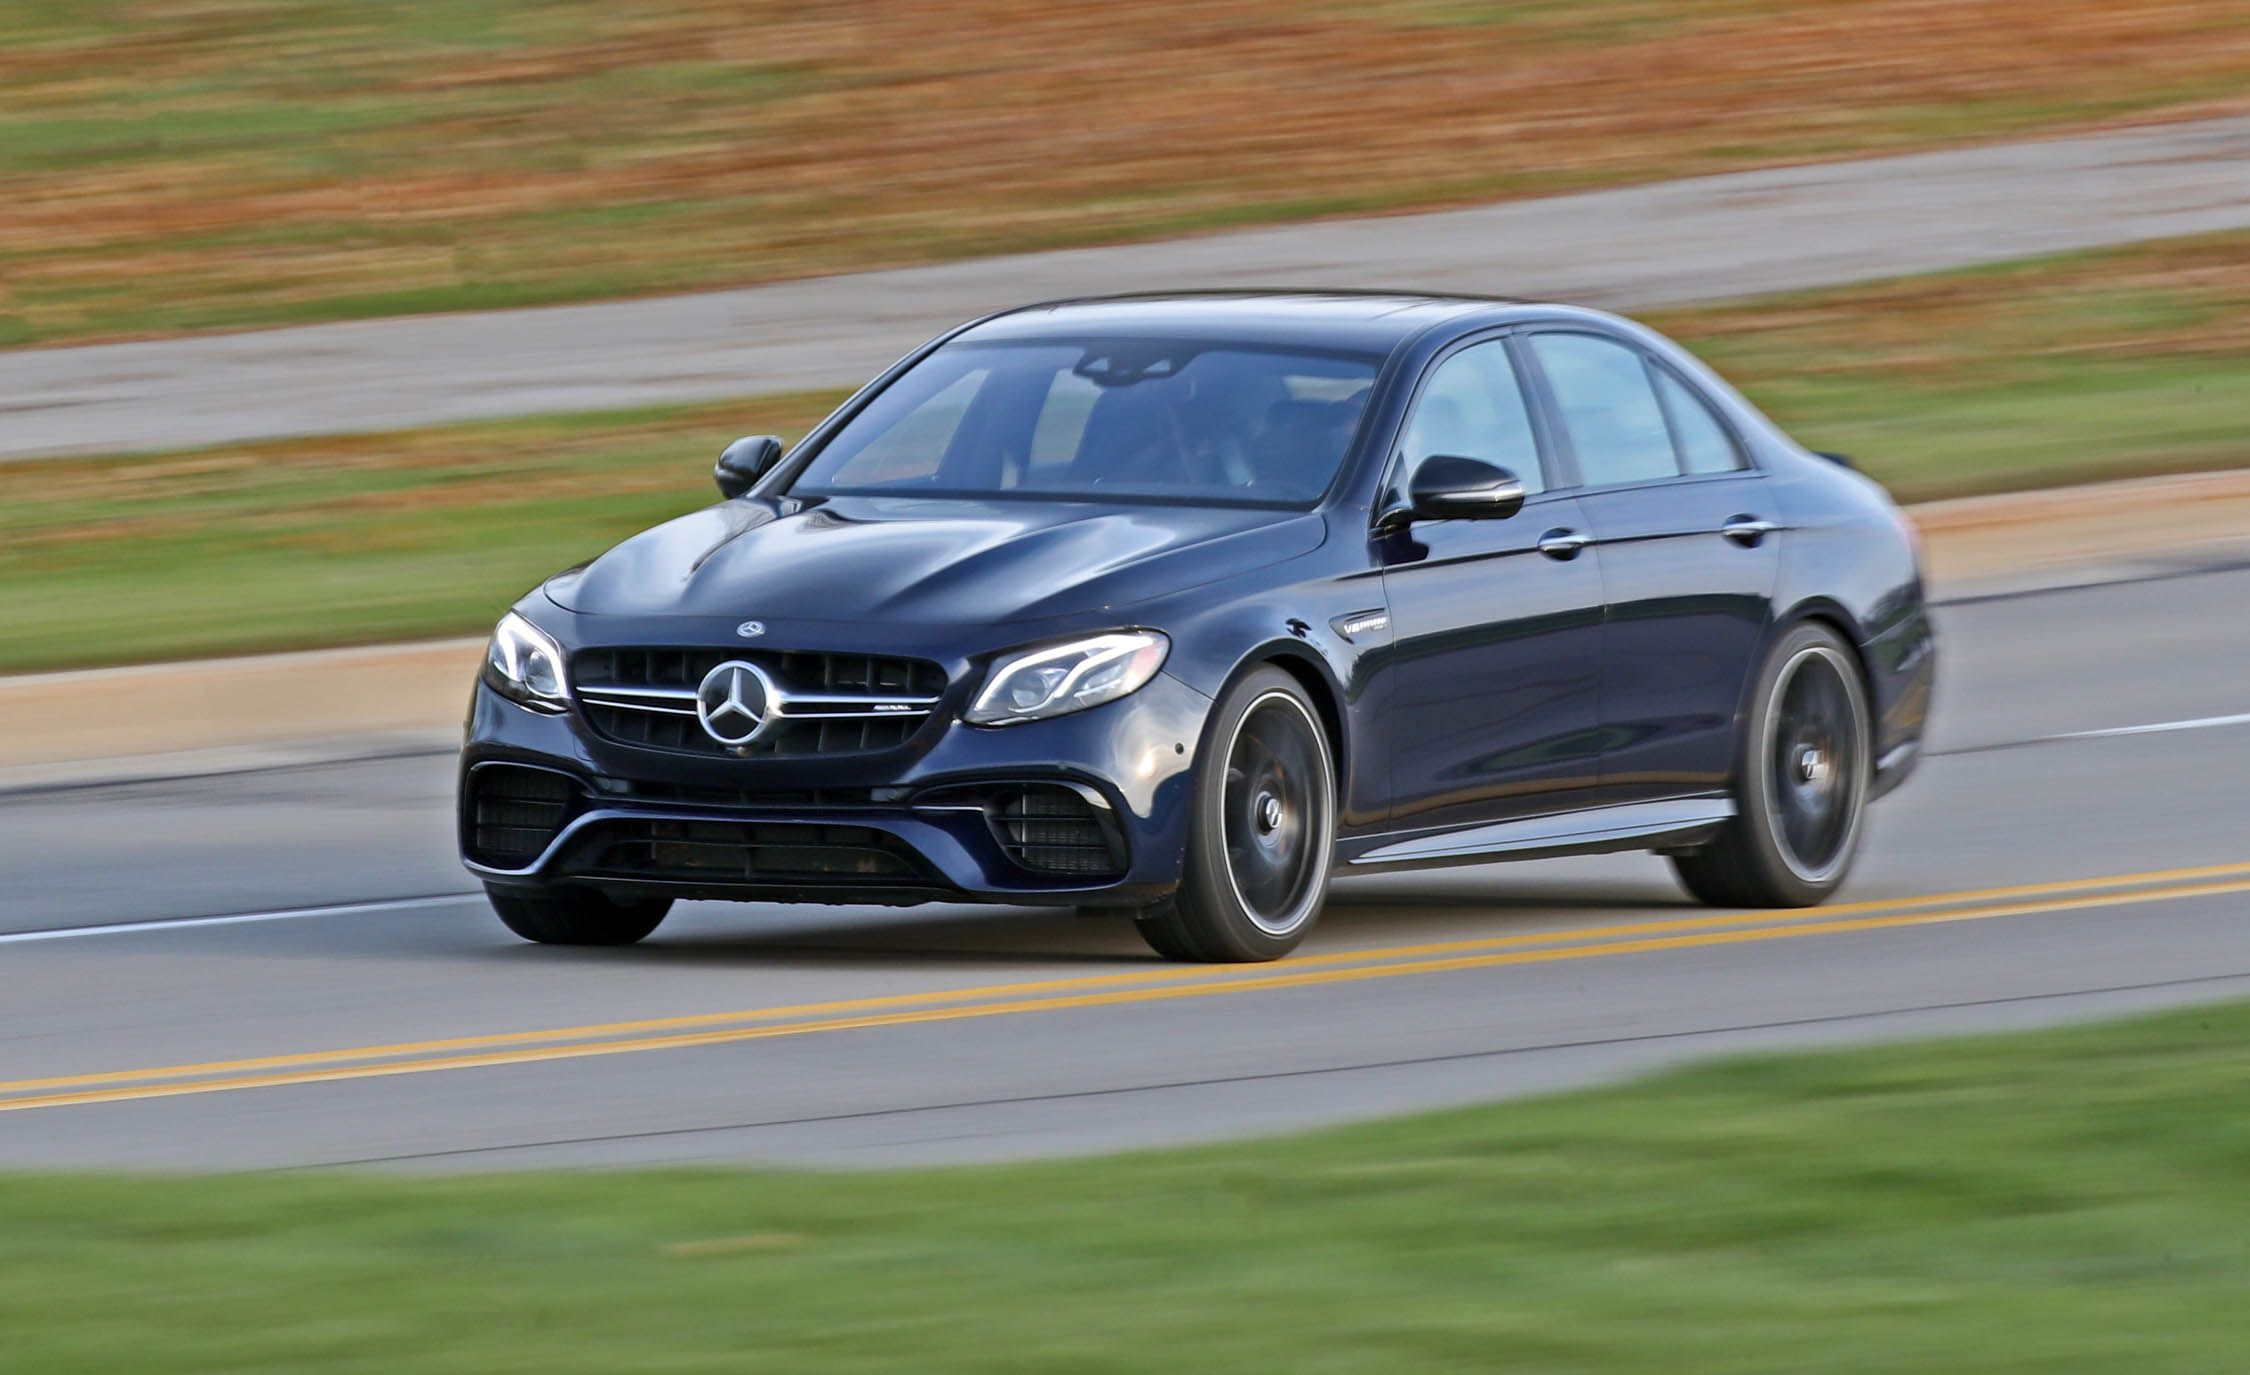 2019 Mercedes Amg E63 S 4matic Reviews Mercedes Amg E63 S 4matic